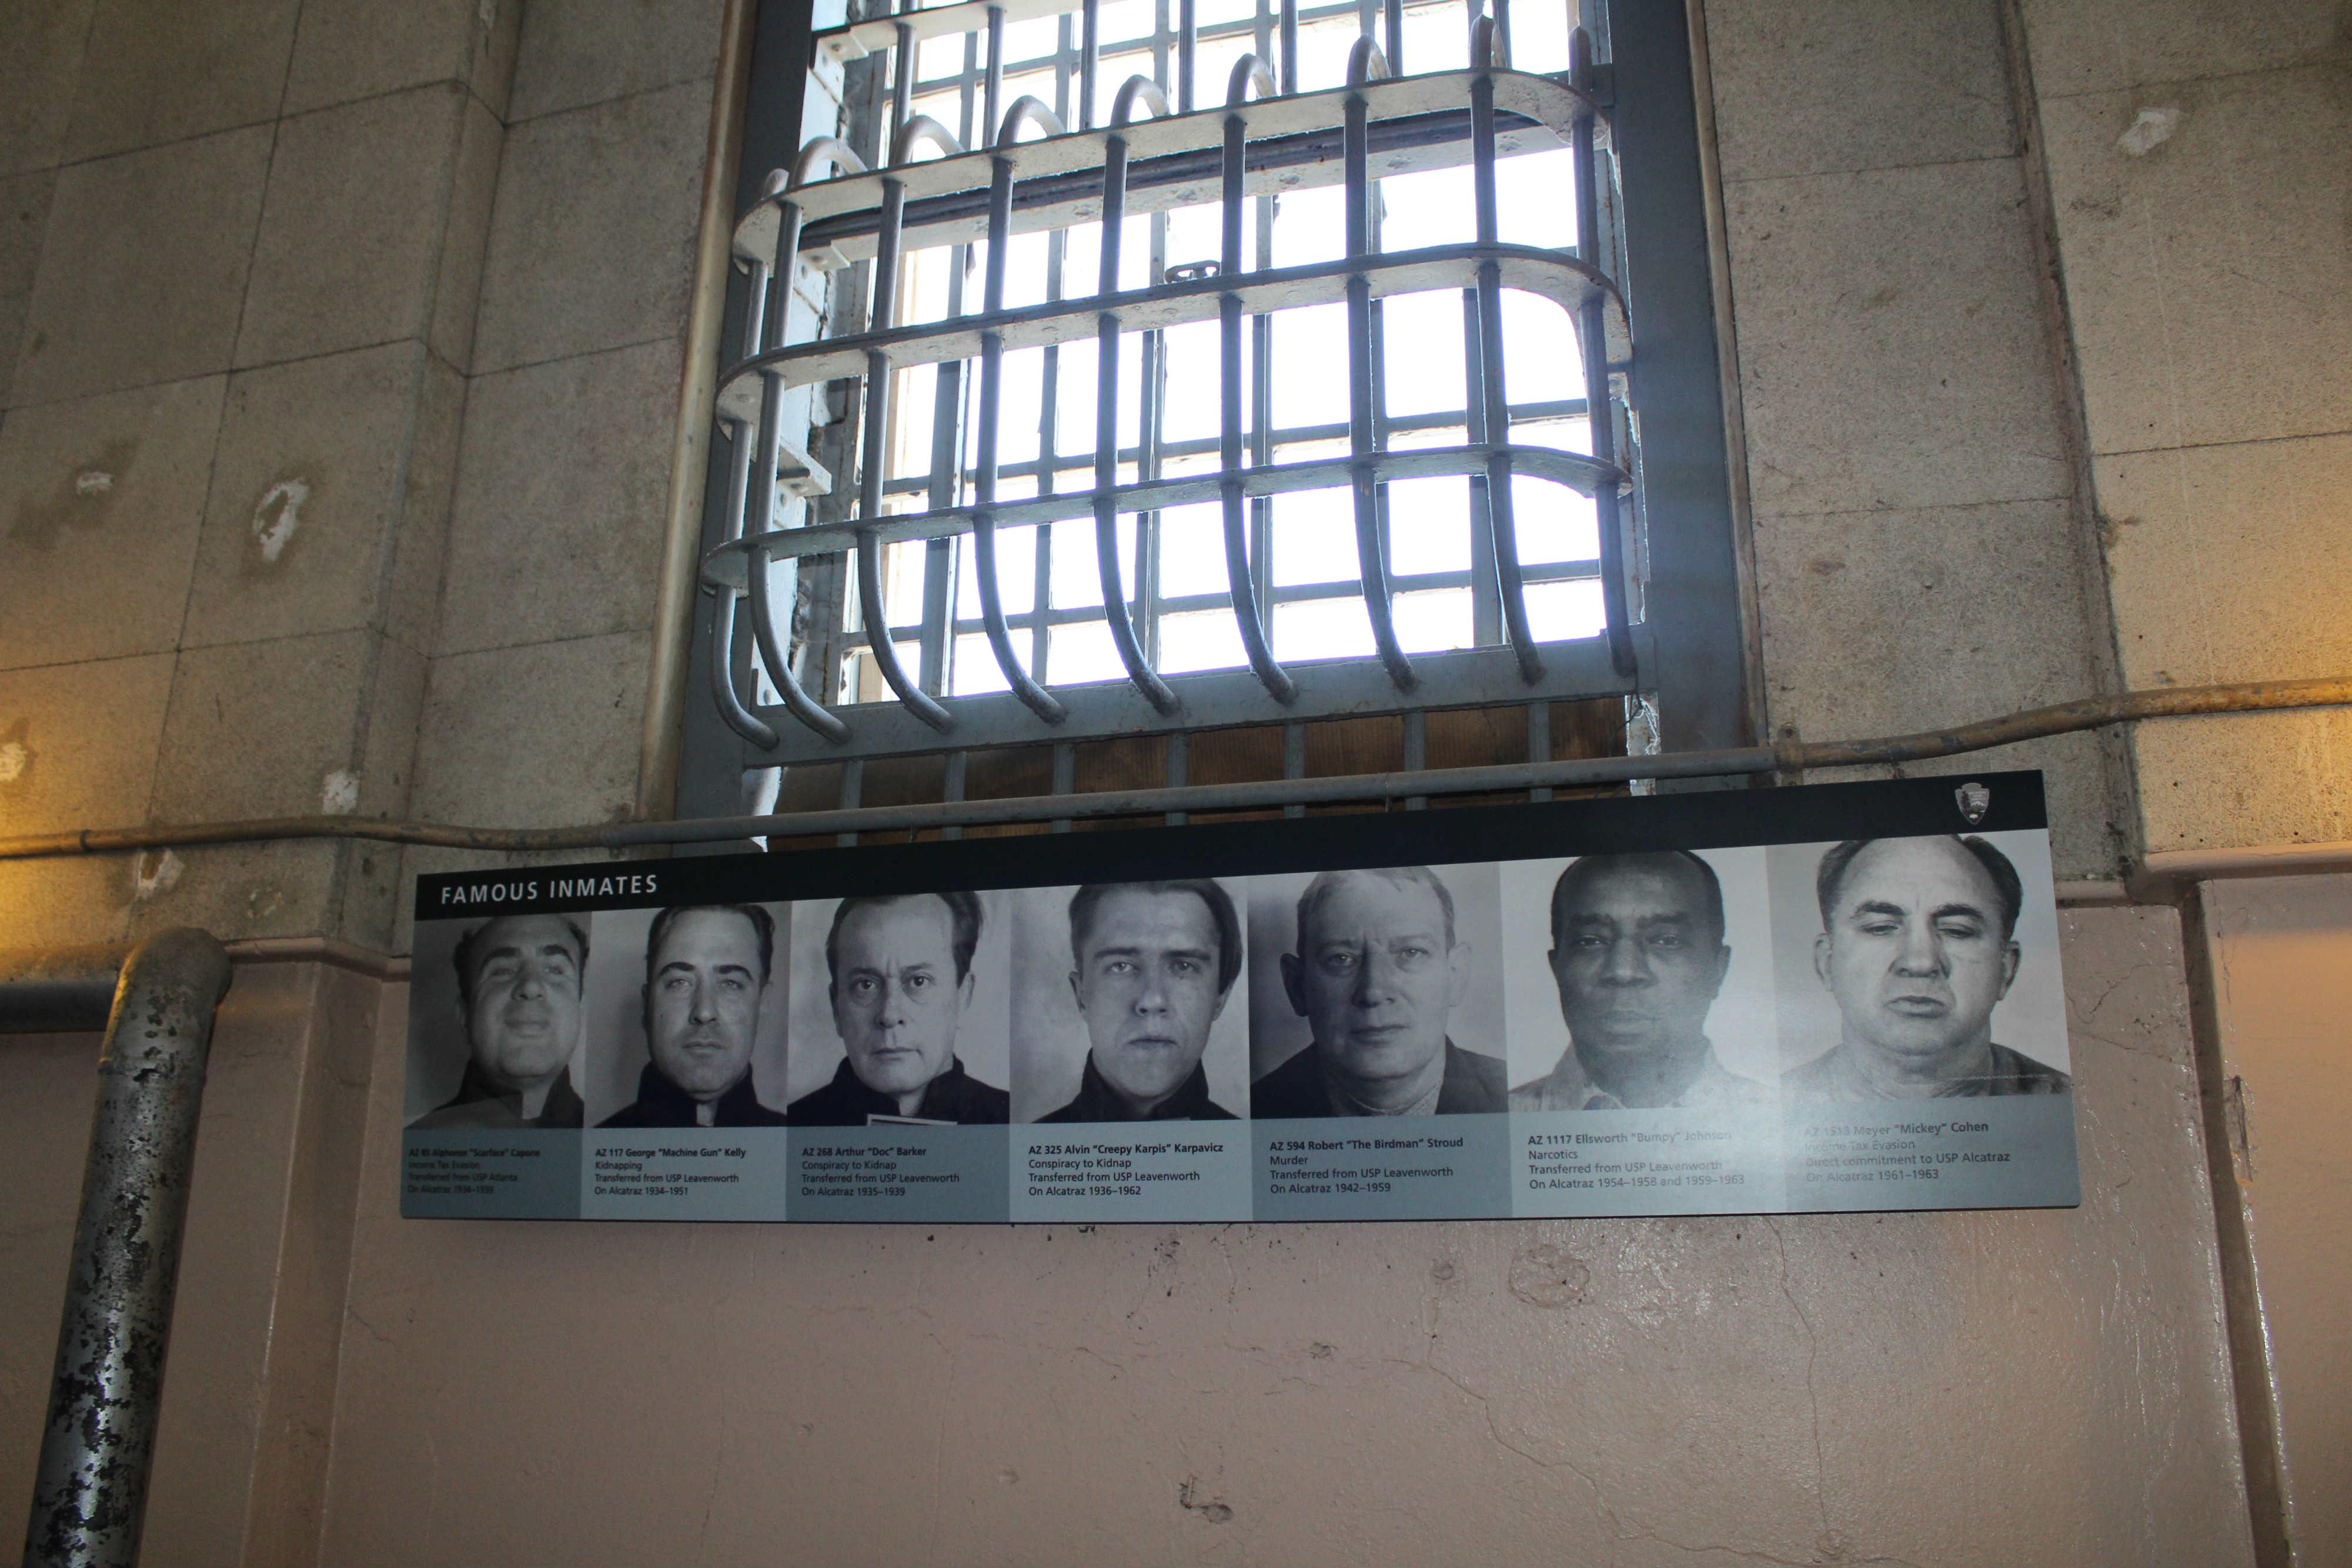 presos famosos